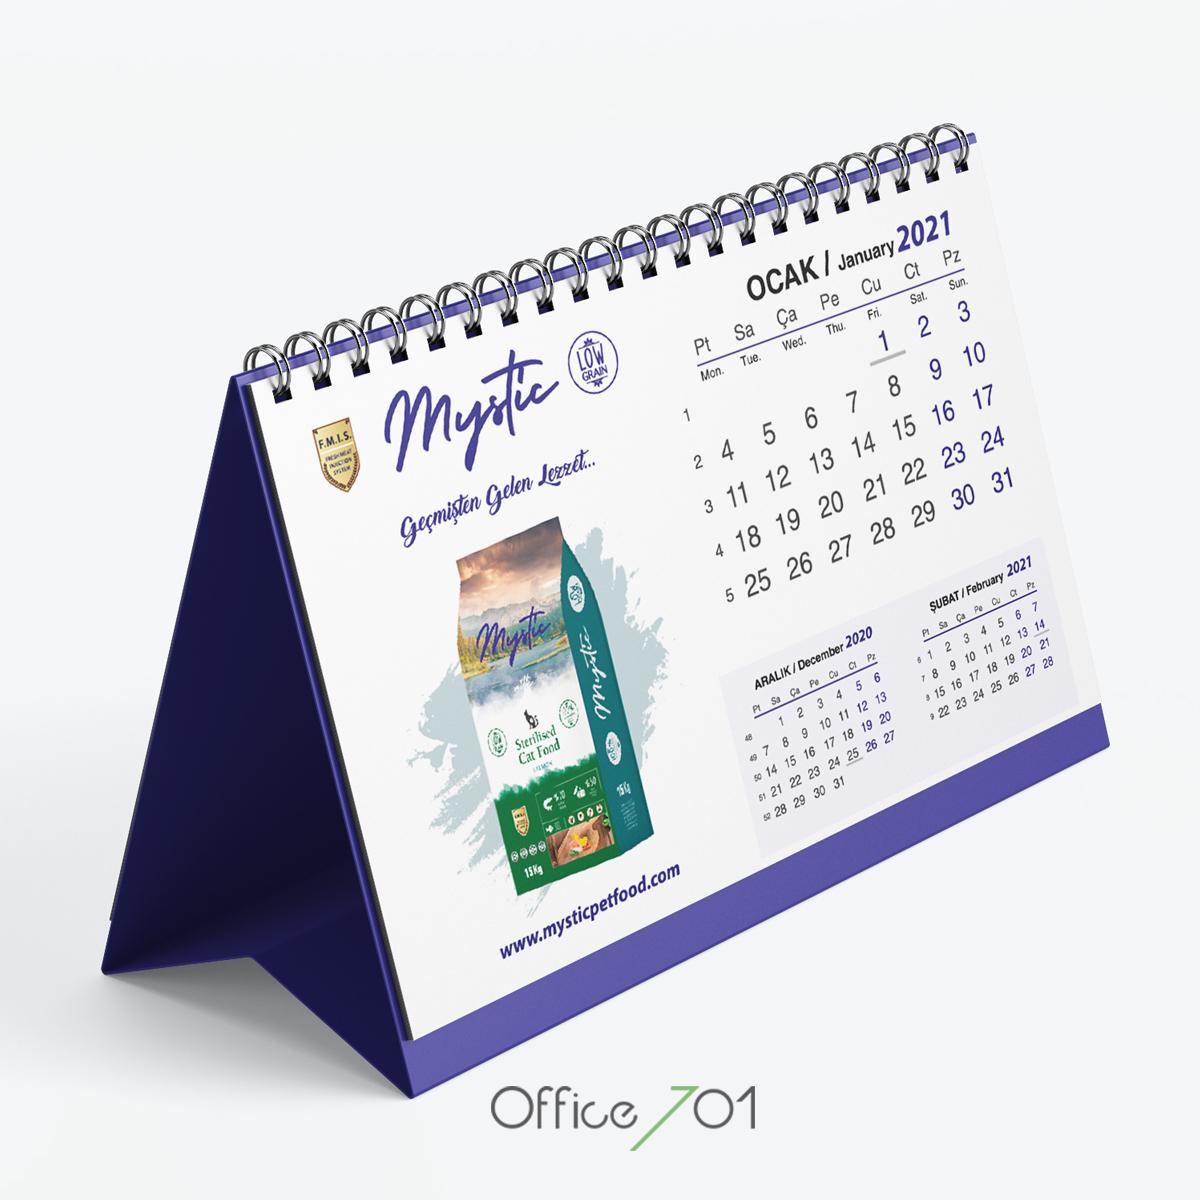 Office701 | Mysticpetfood Takvim Tasarımı